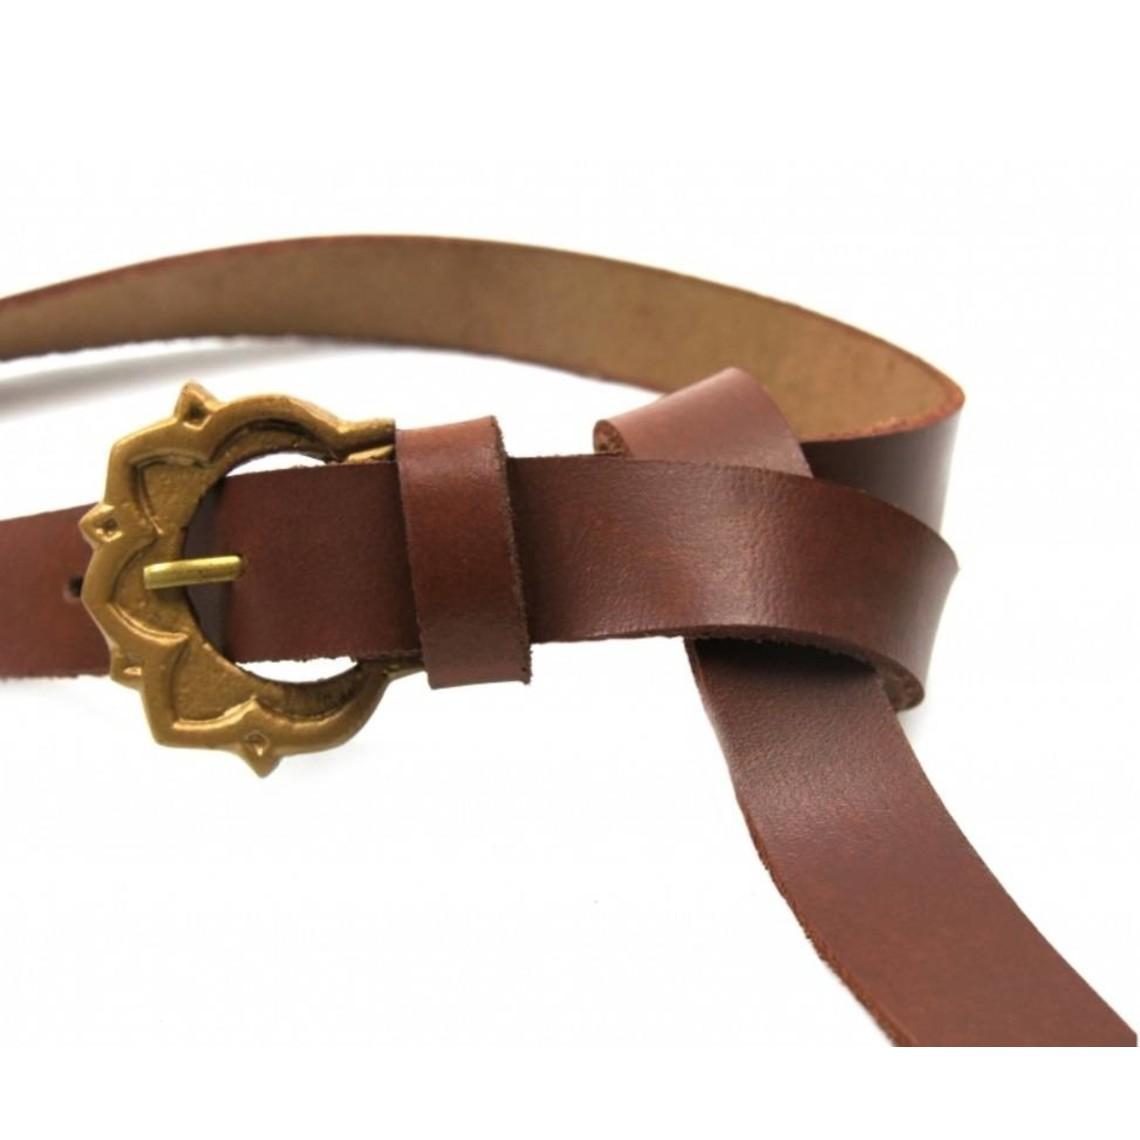 Leonardo Carbone Medeltids bälte Iseburgis, brun